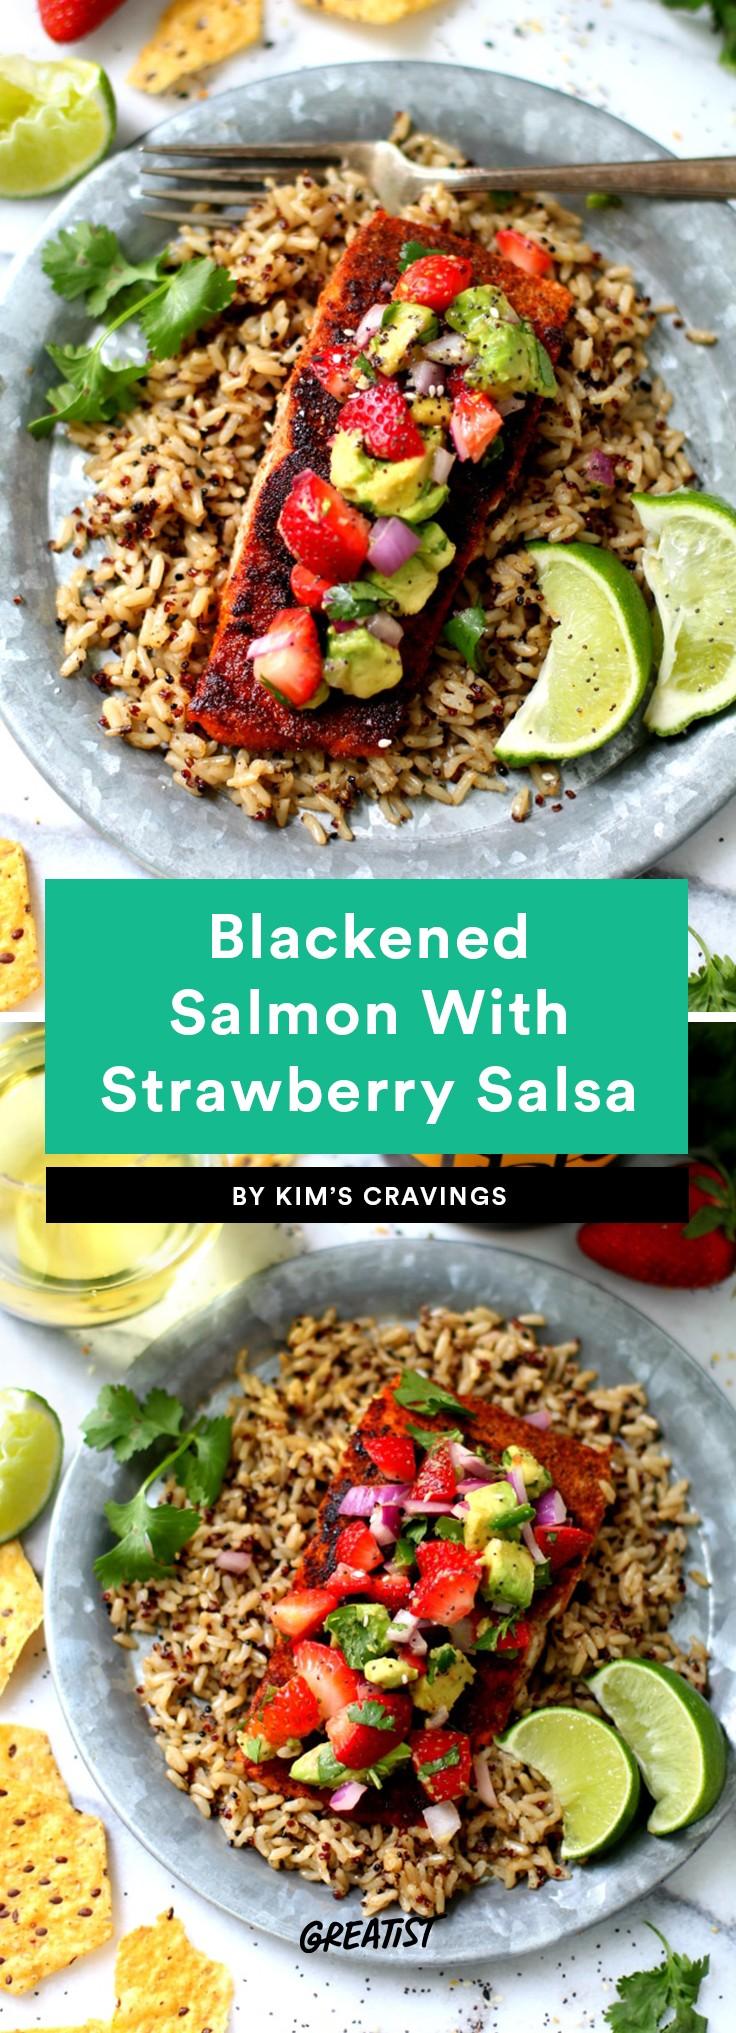 Blackened Salmon With Strawberry Salsa